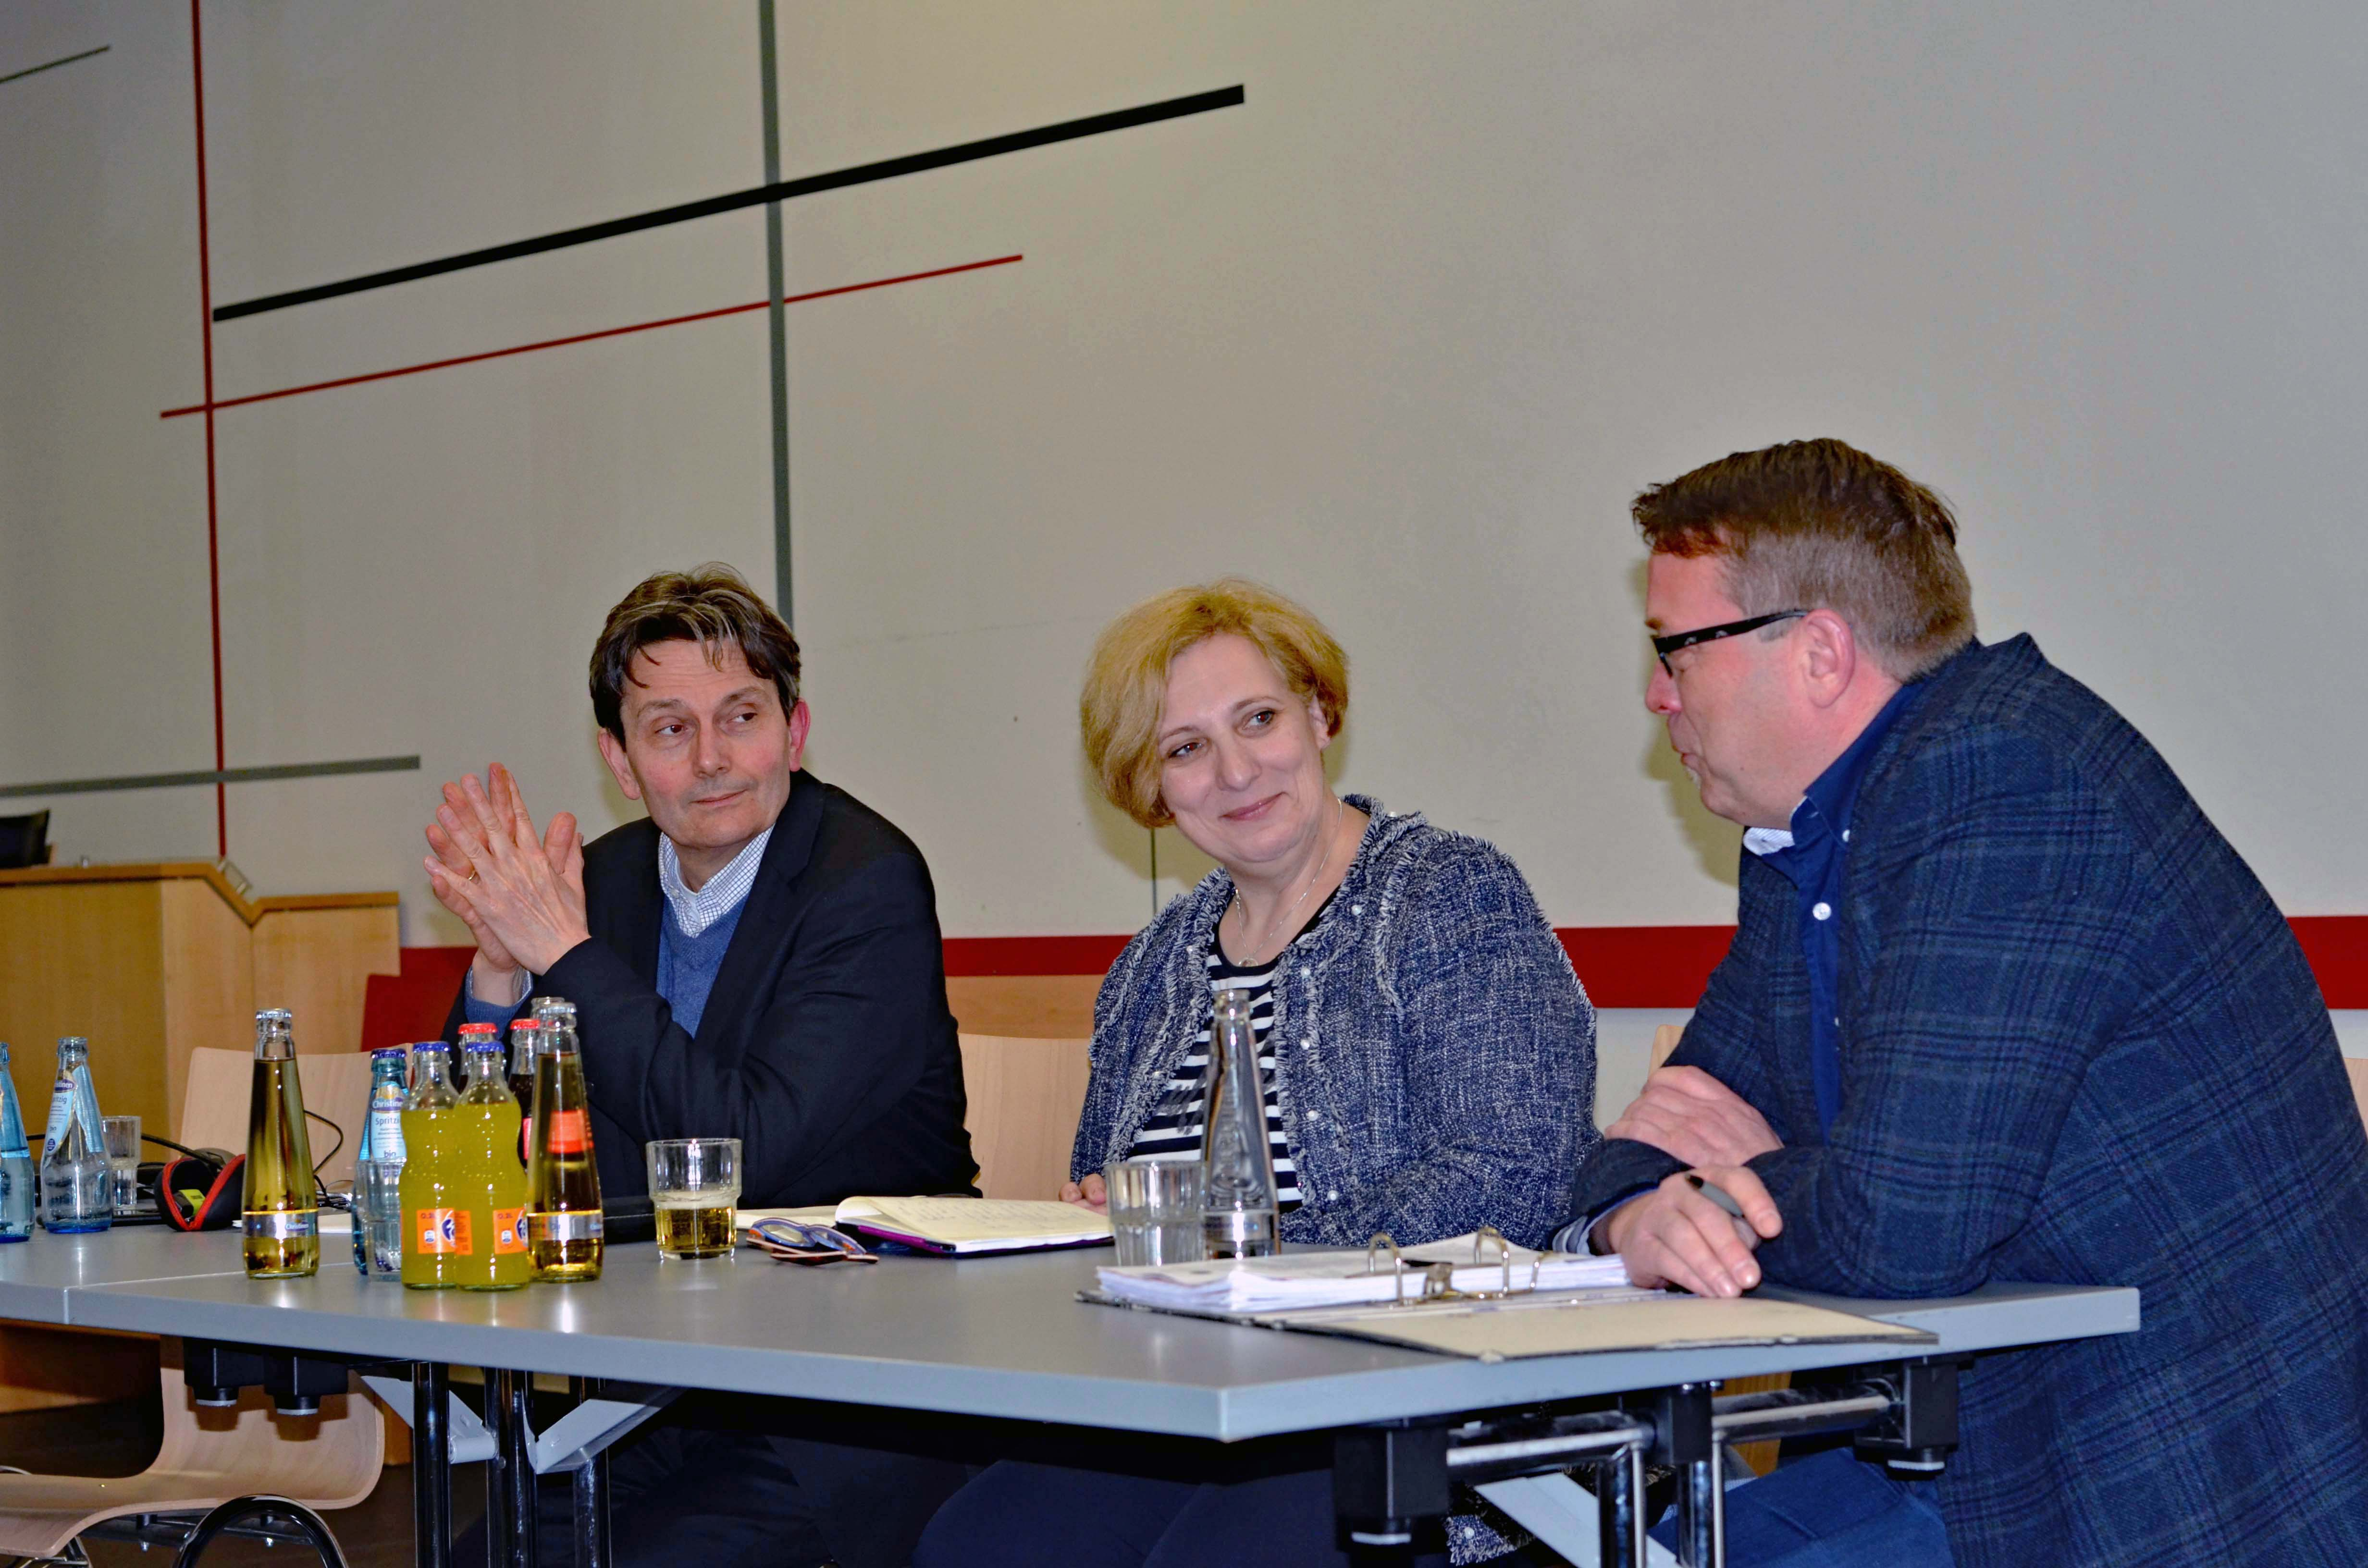 Dr. Rolf Mützenich und Dr. Daniela De Ridder im Gespräch